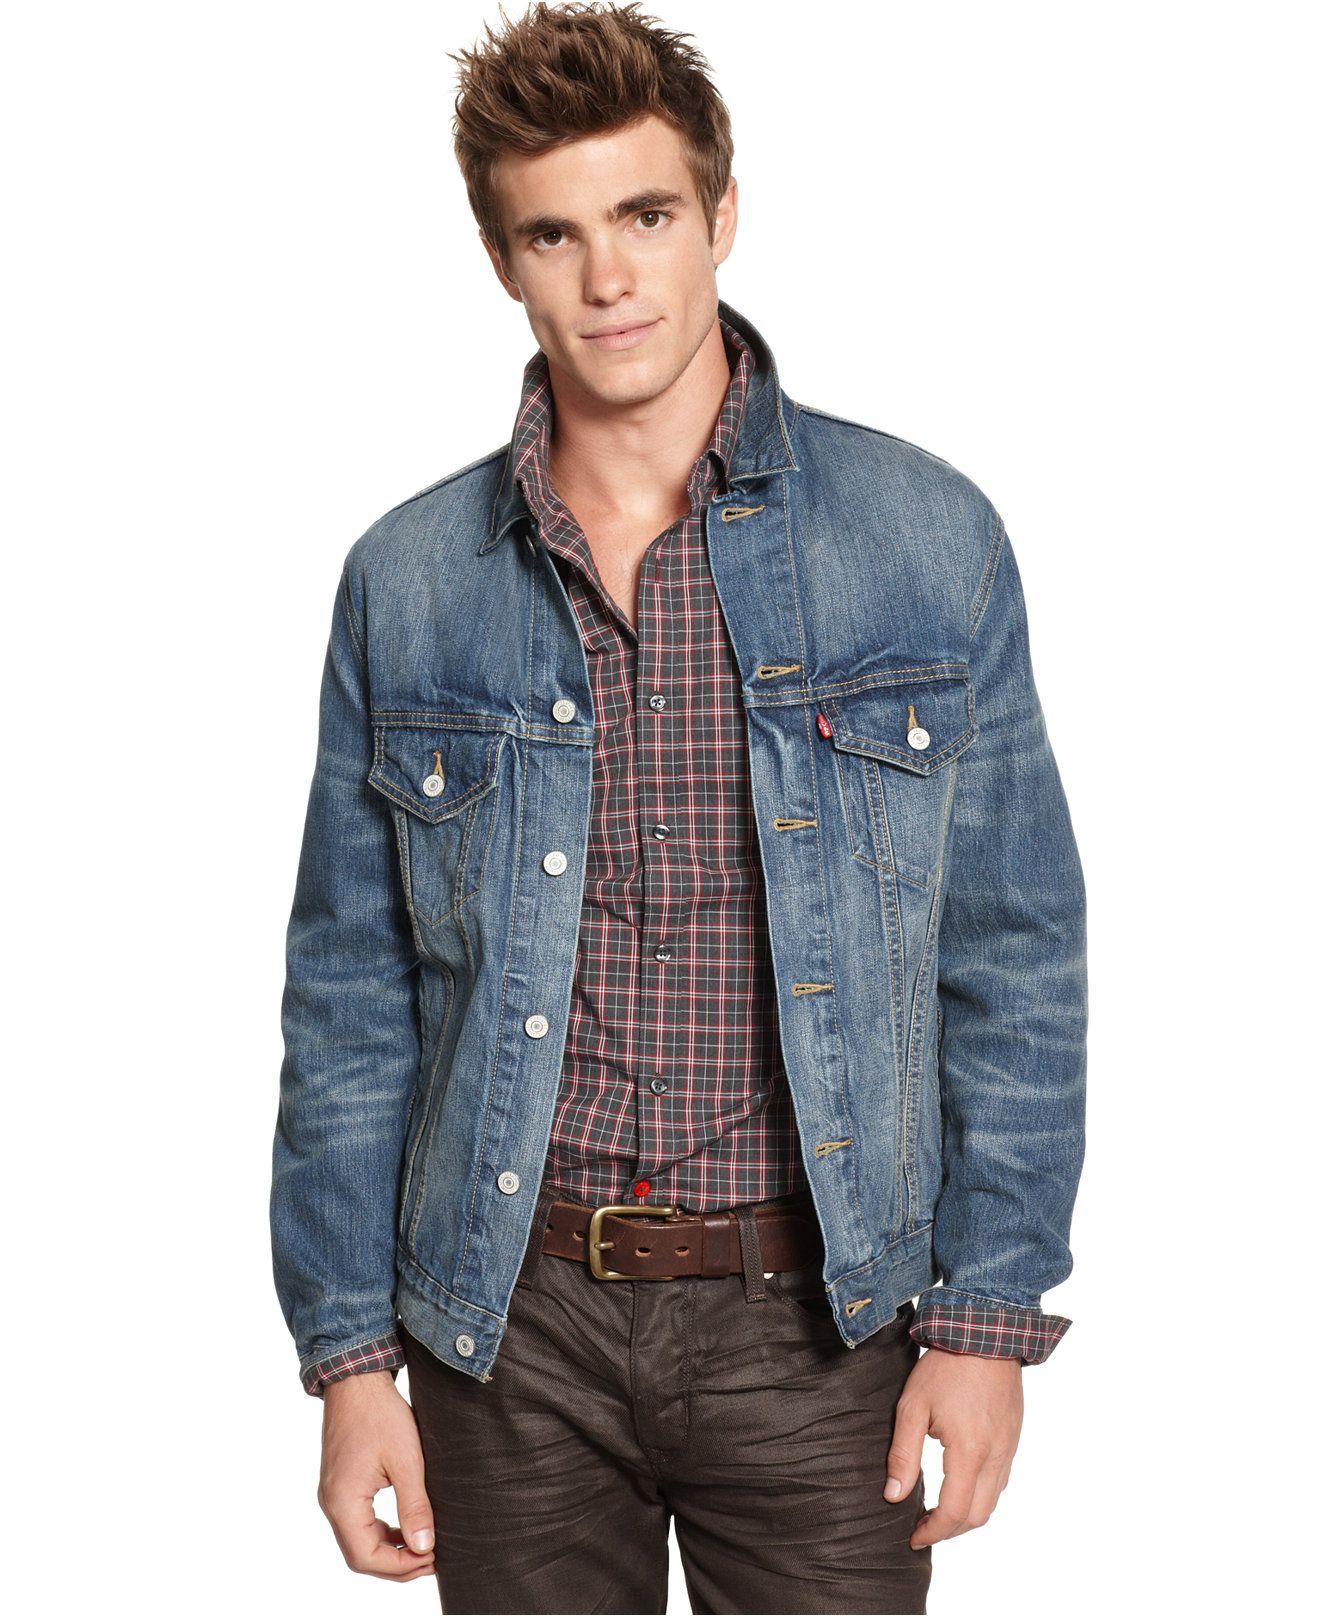 Levi's Dark Summit Trucker Jacket - Coats & Jackets - Men - Macy's ...